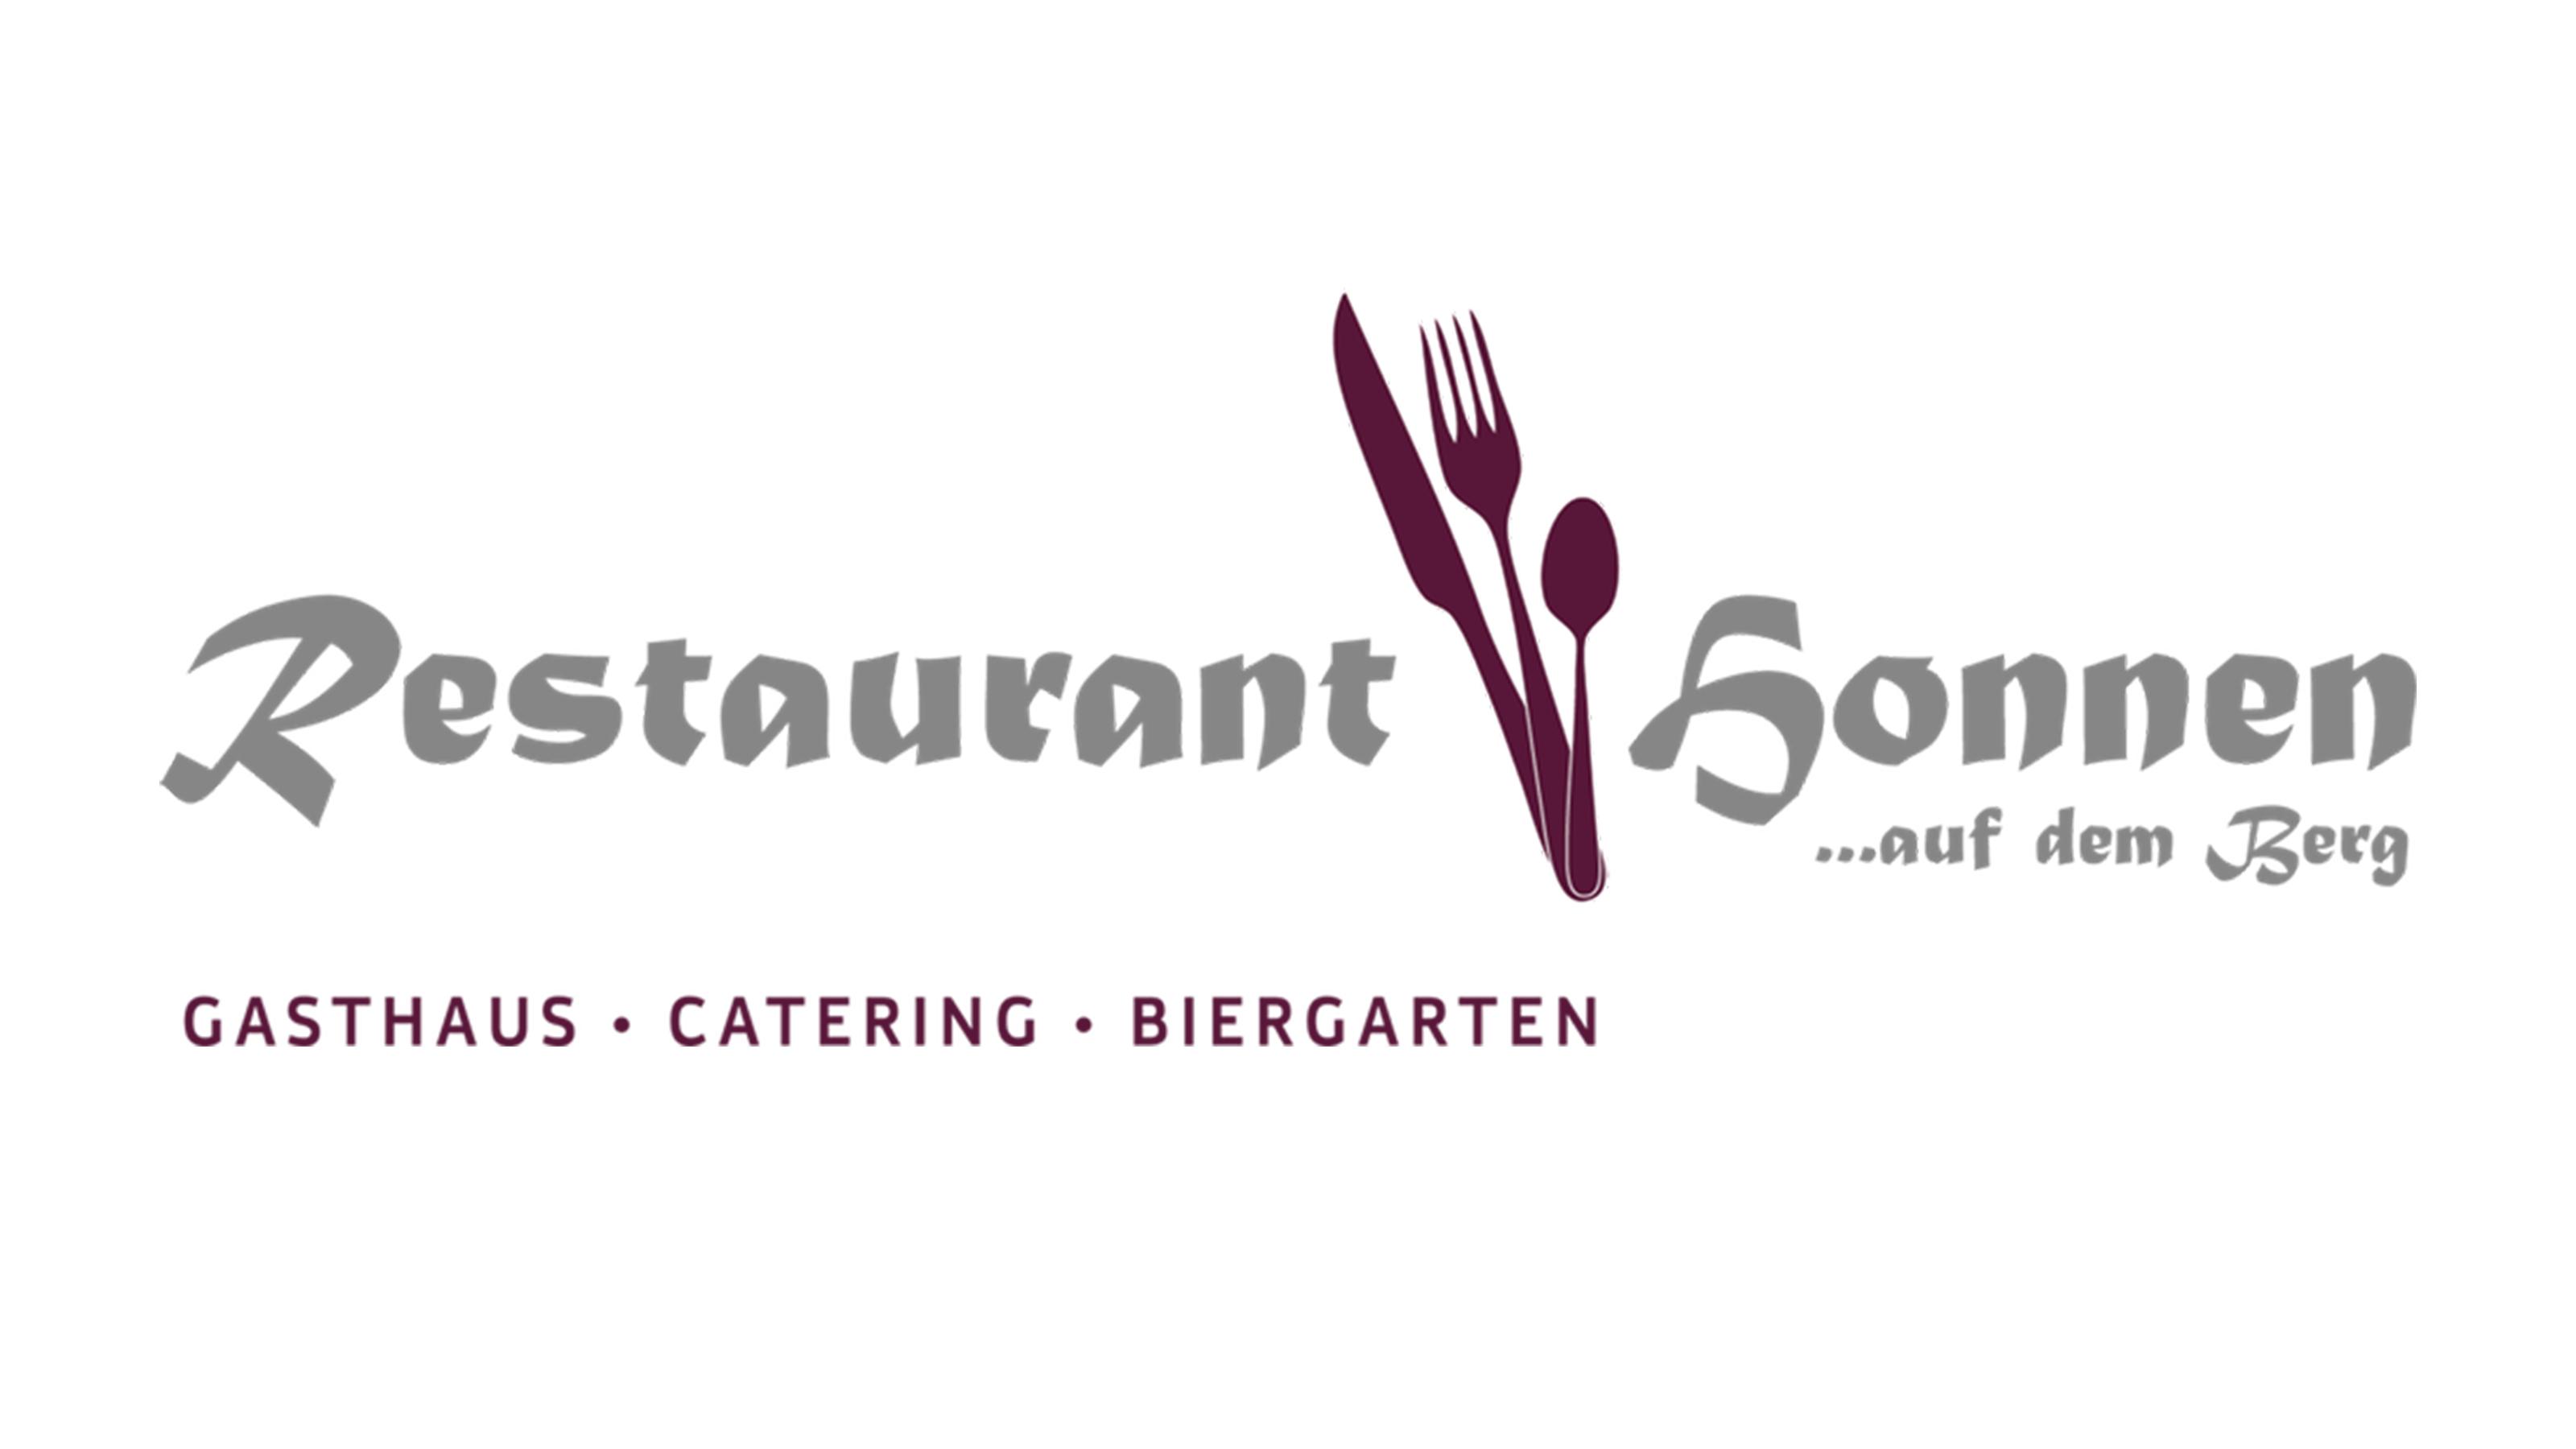 Restaurant Honnen